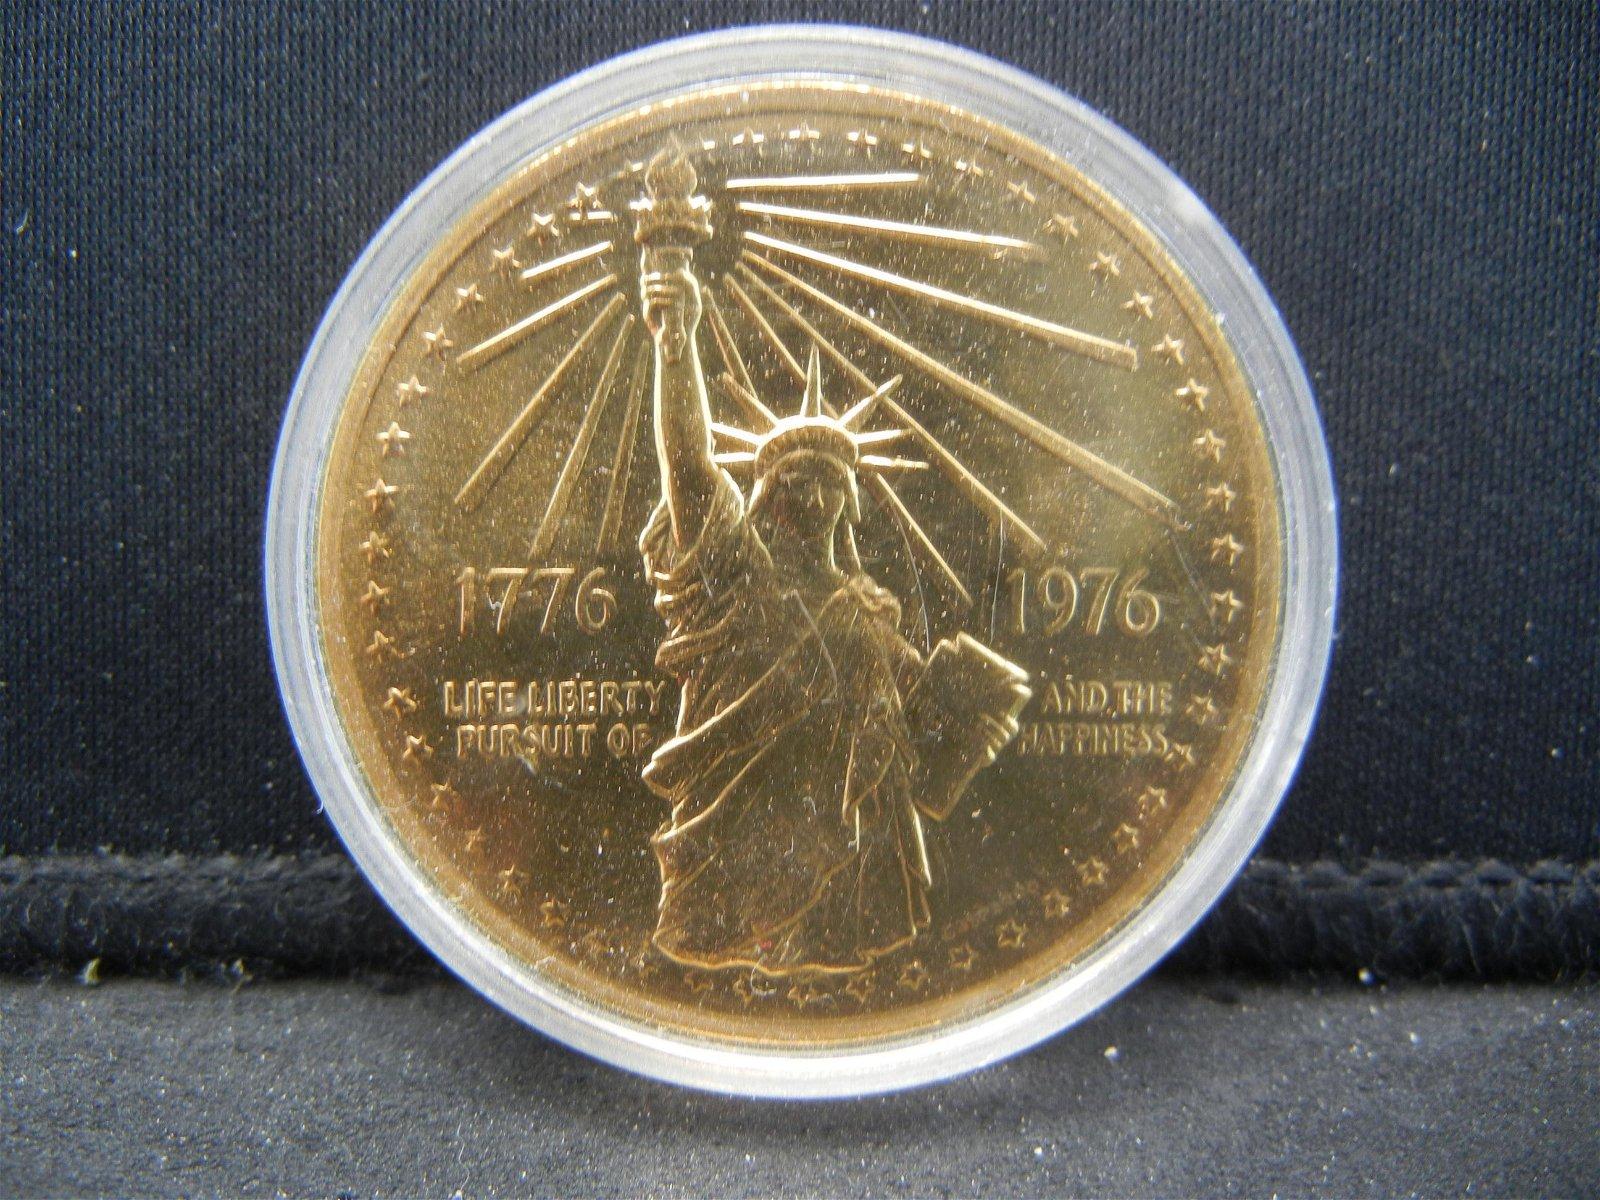 1776-1976 American Revolution Bicentennial Medal.